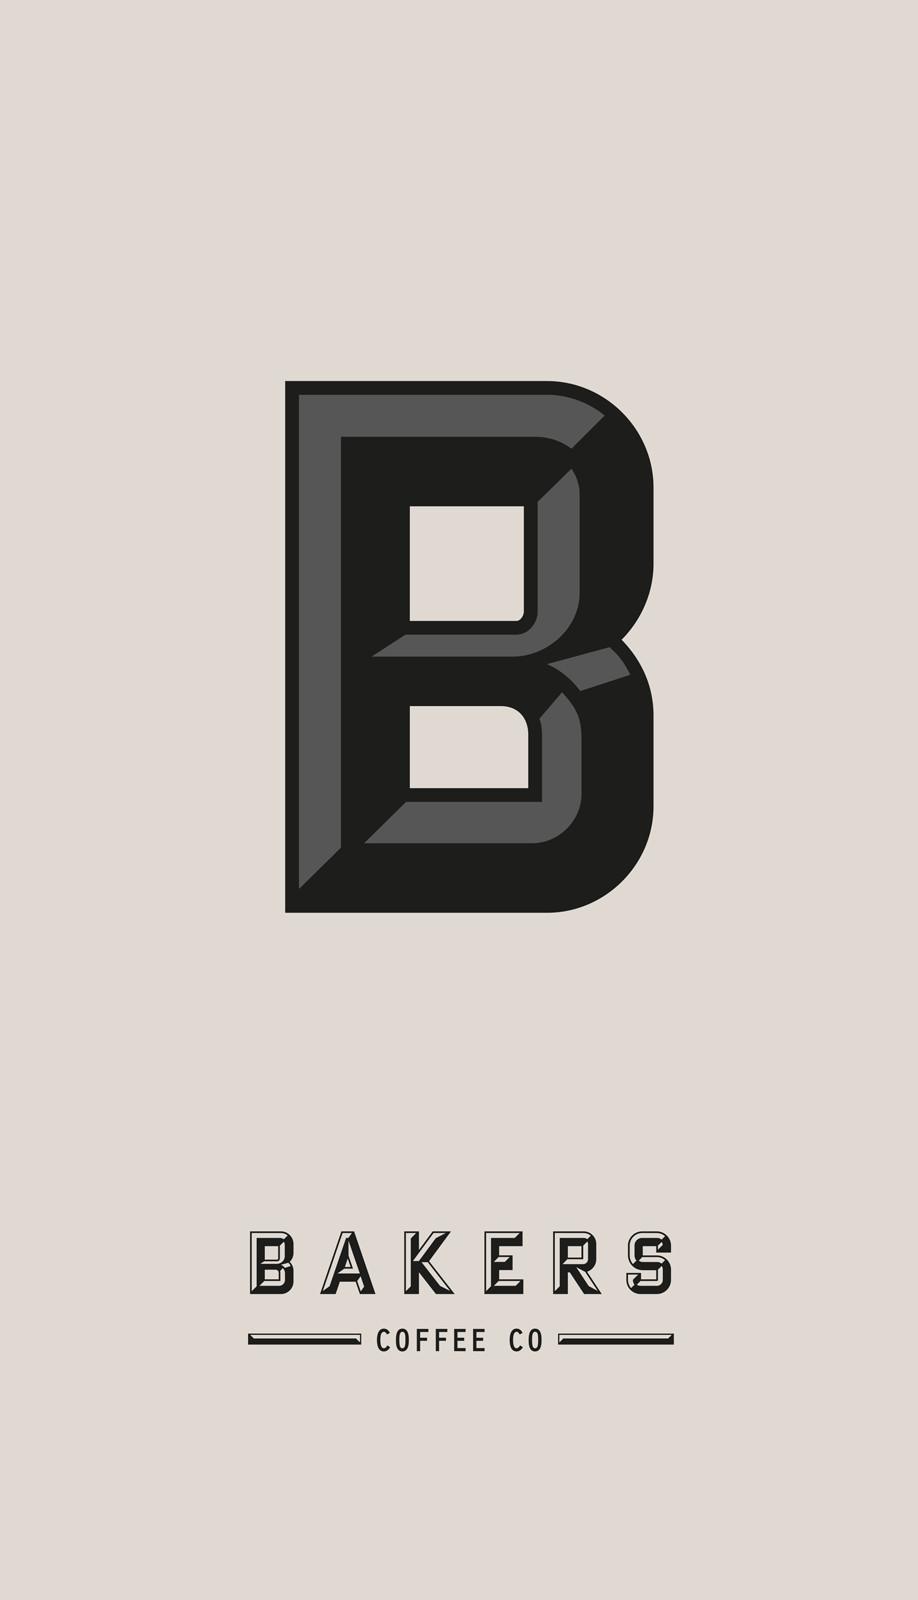 bakers_branding_05_2